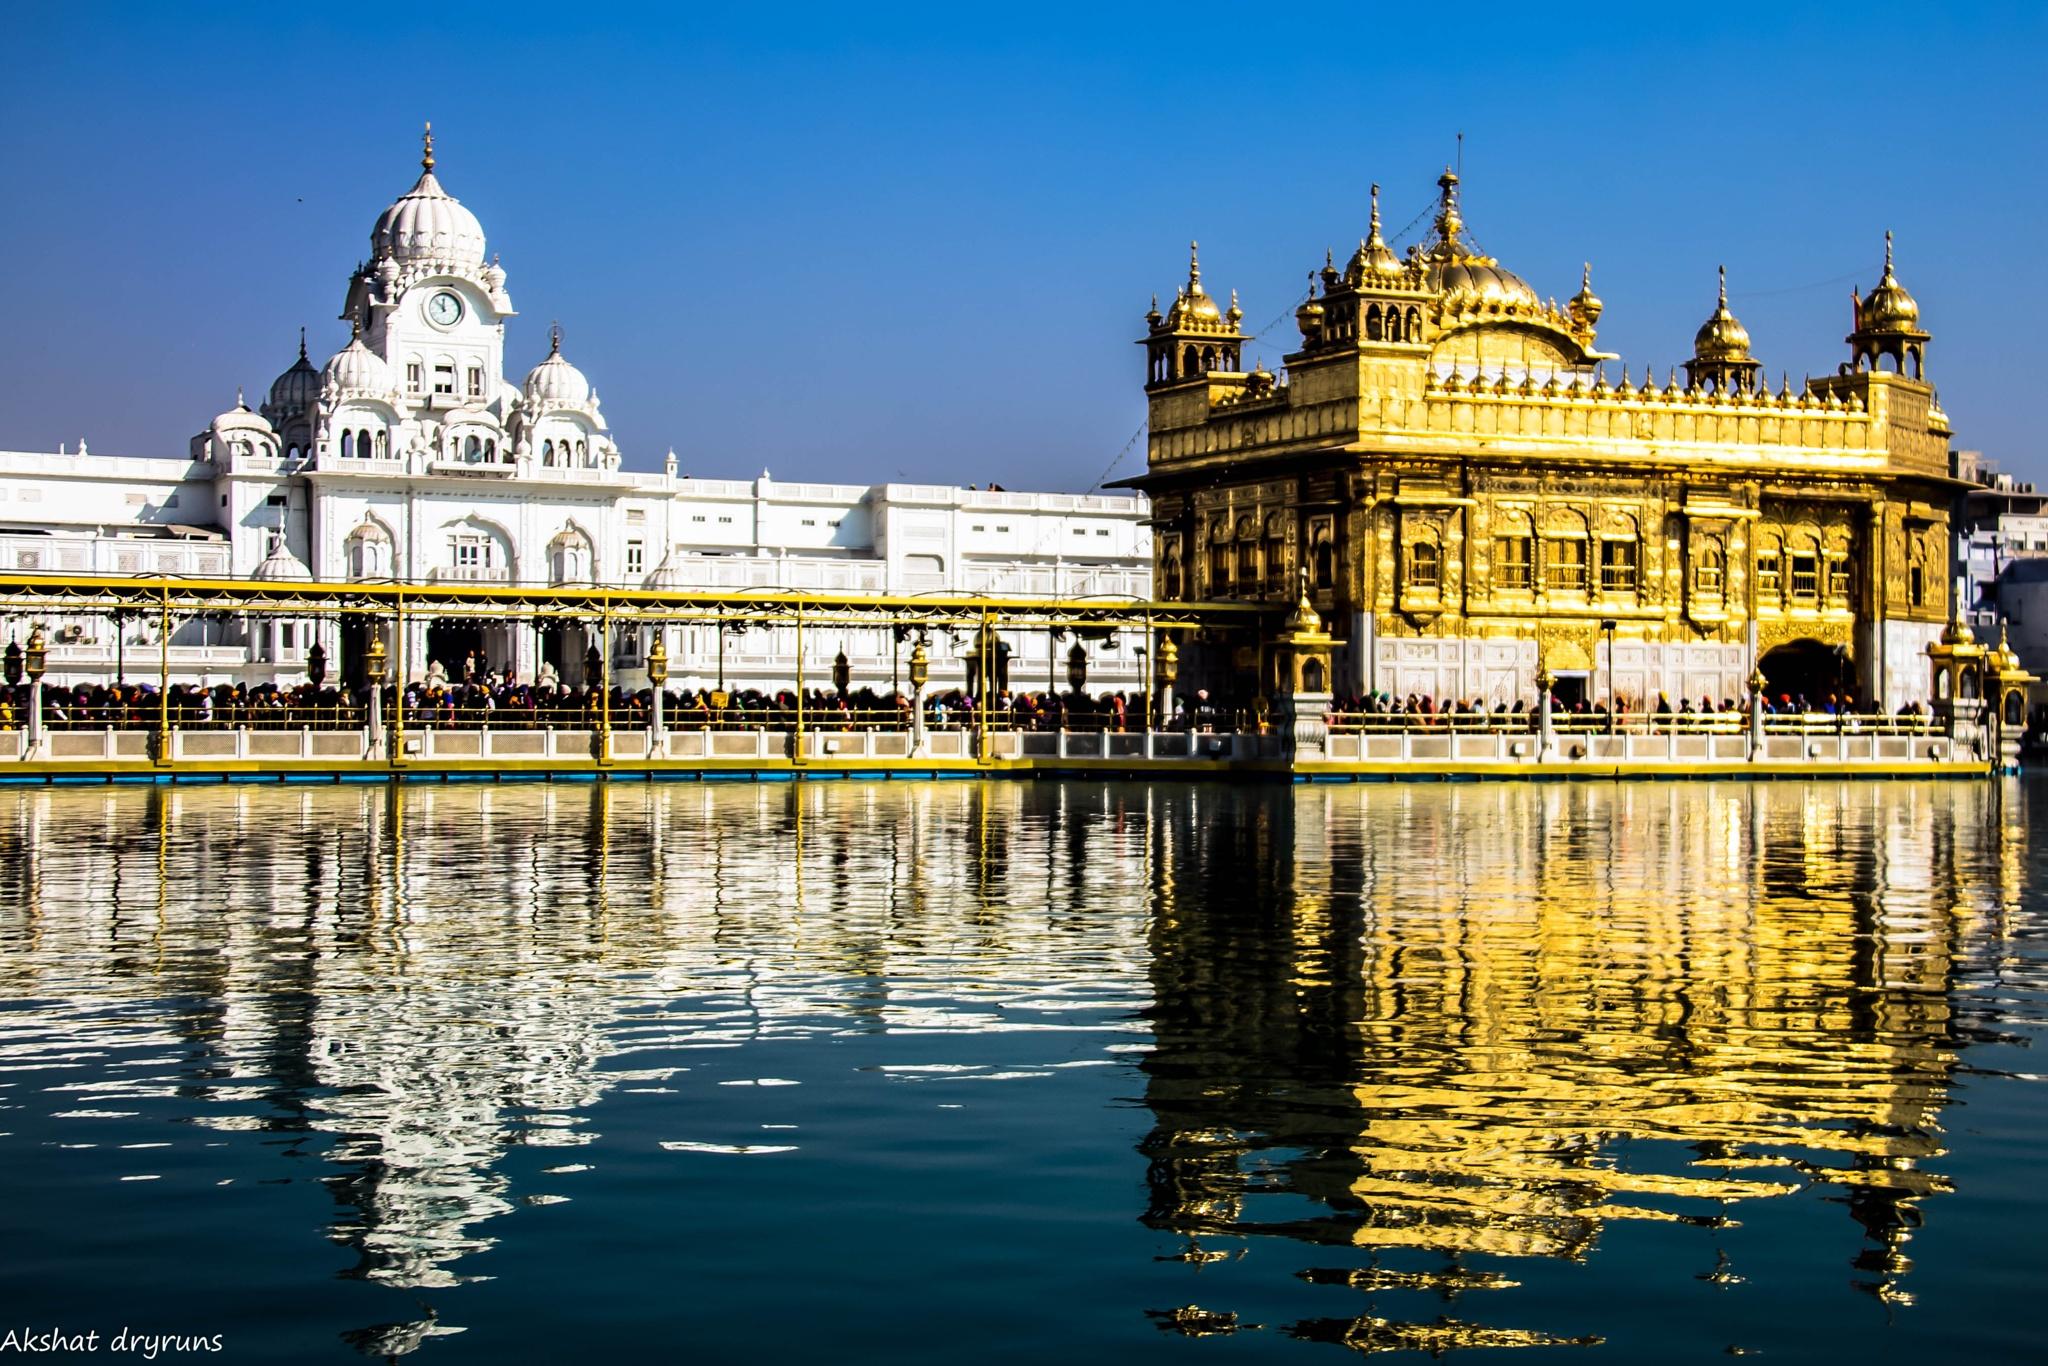 Golden Temple Amritsar by Akshat dryruns